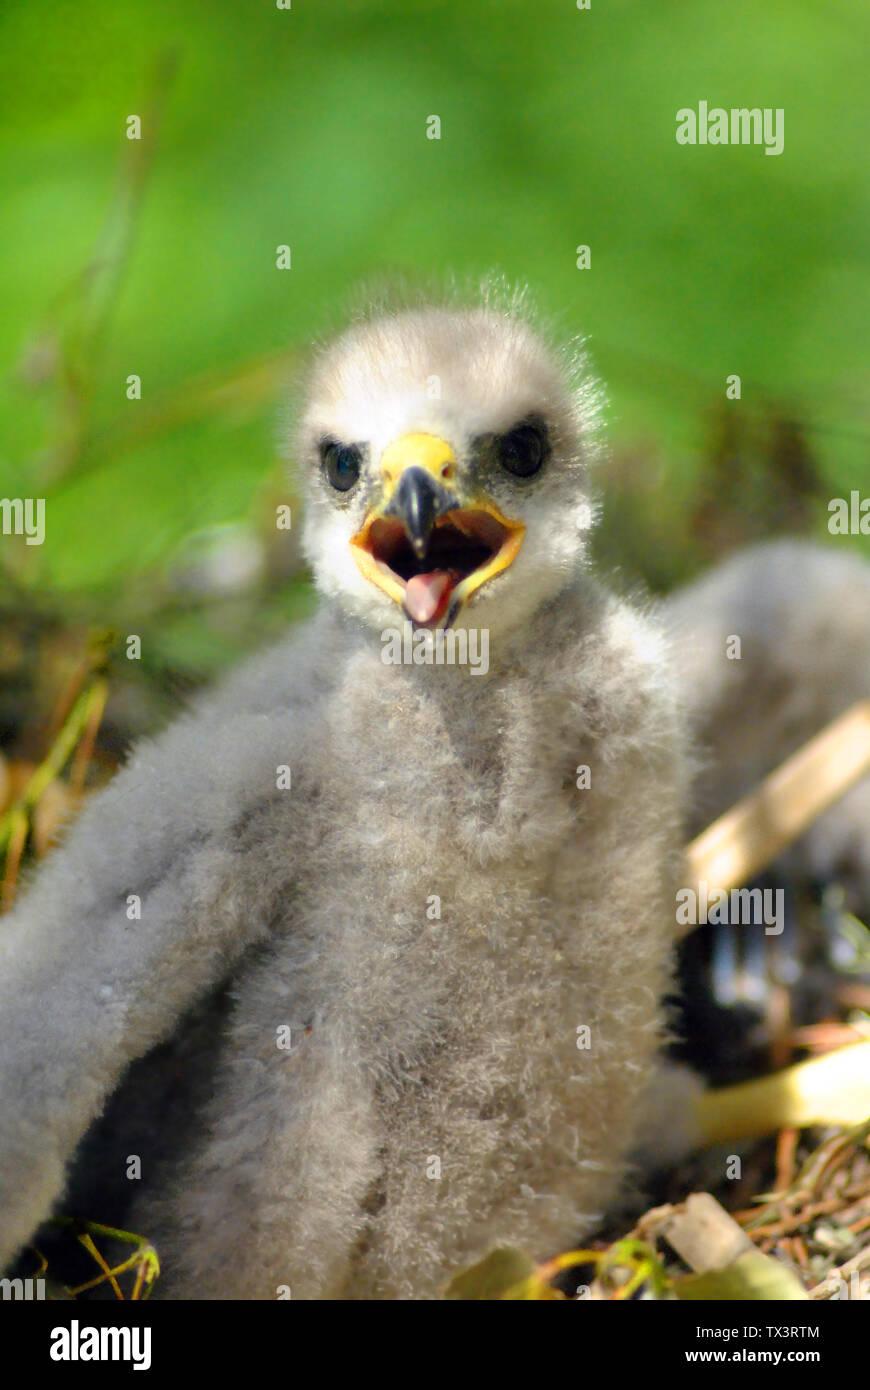 Hatchling the common kestrel (Falco tinnunculus, European kestrel, Eurasian kestrel, Old World kestrel) bird of prey species, falcon family Falconidae - Stock Image